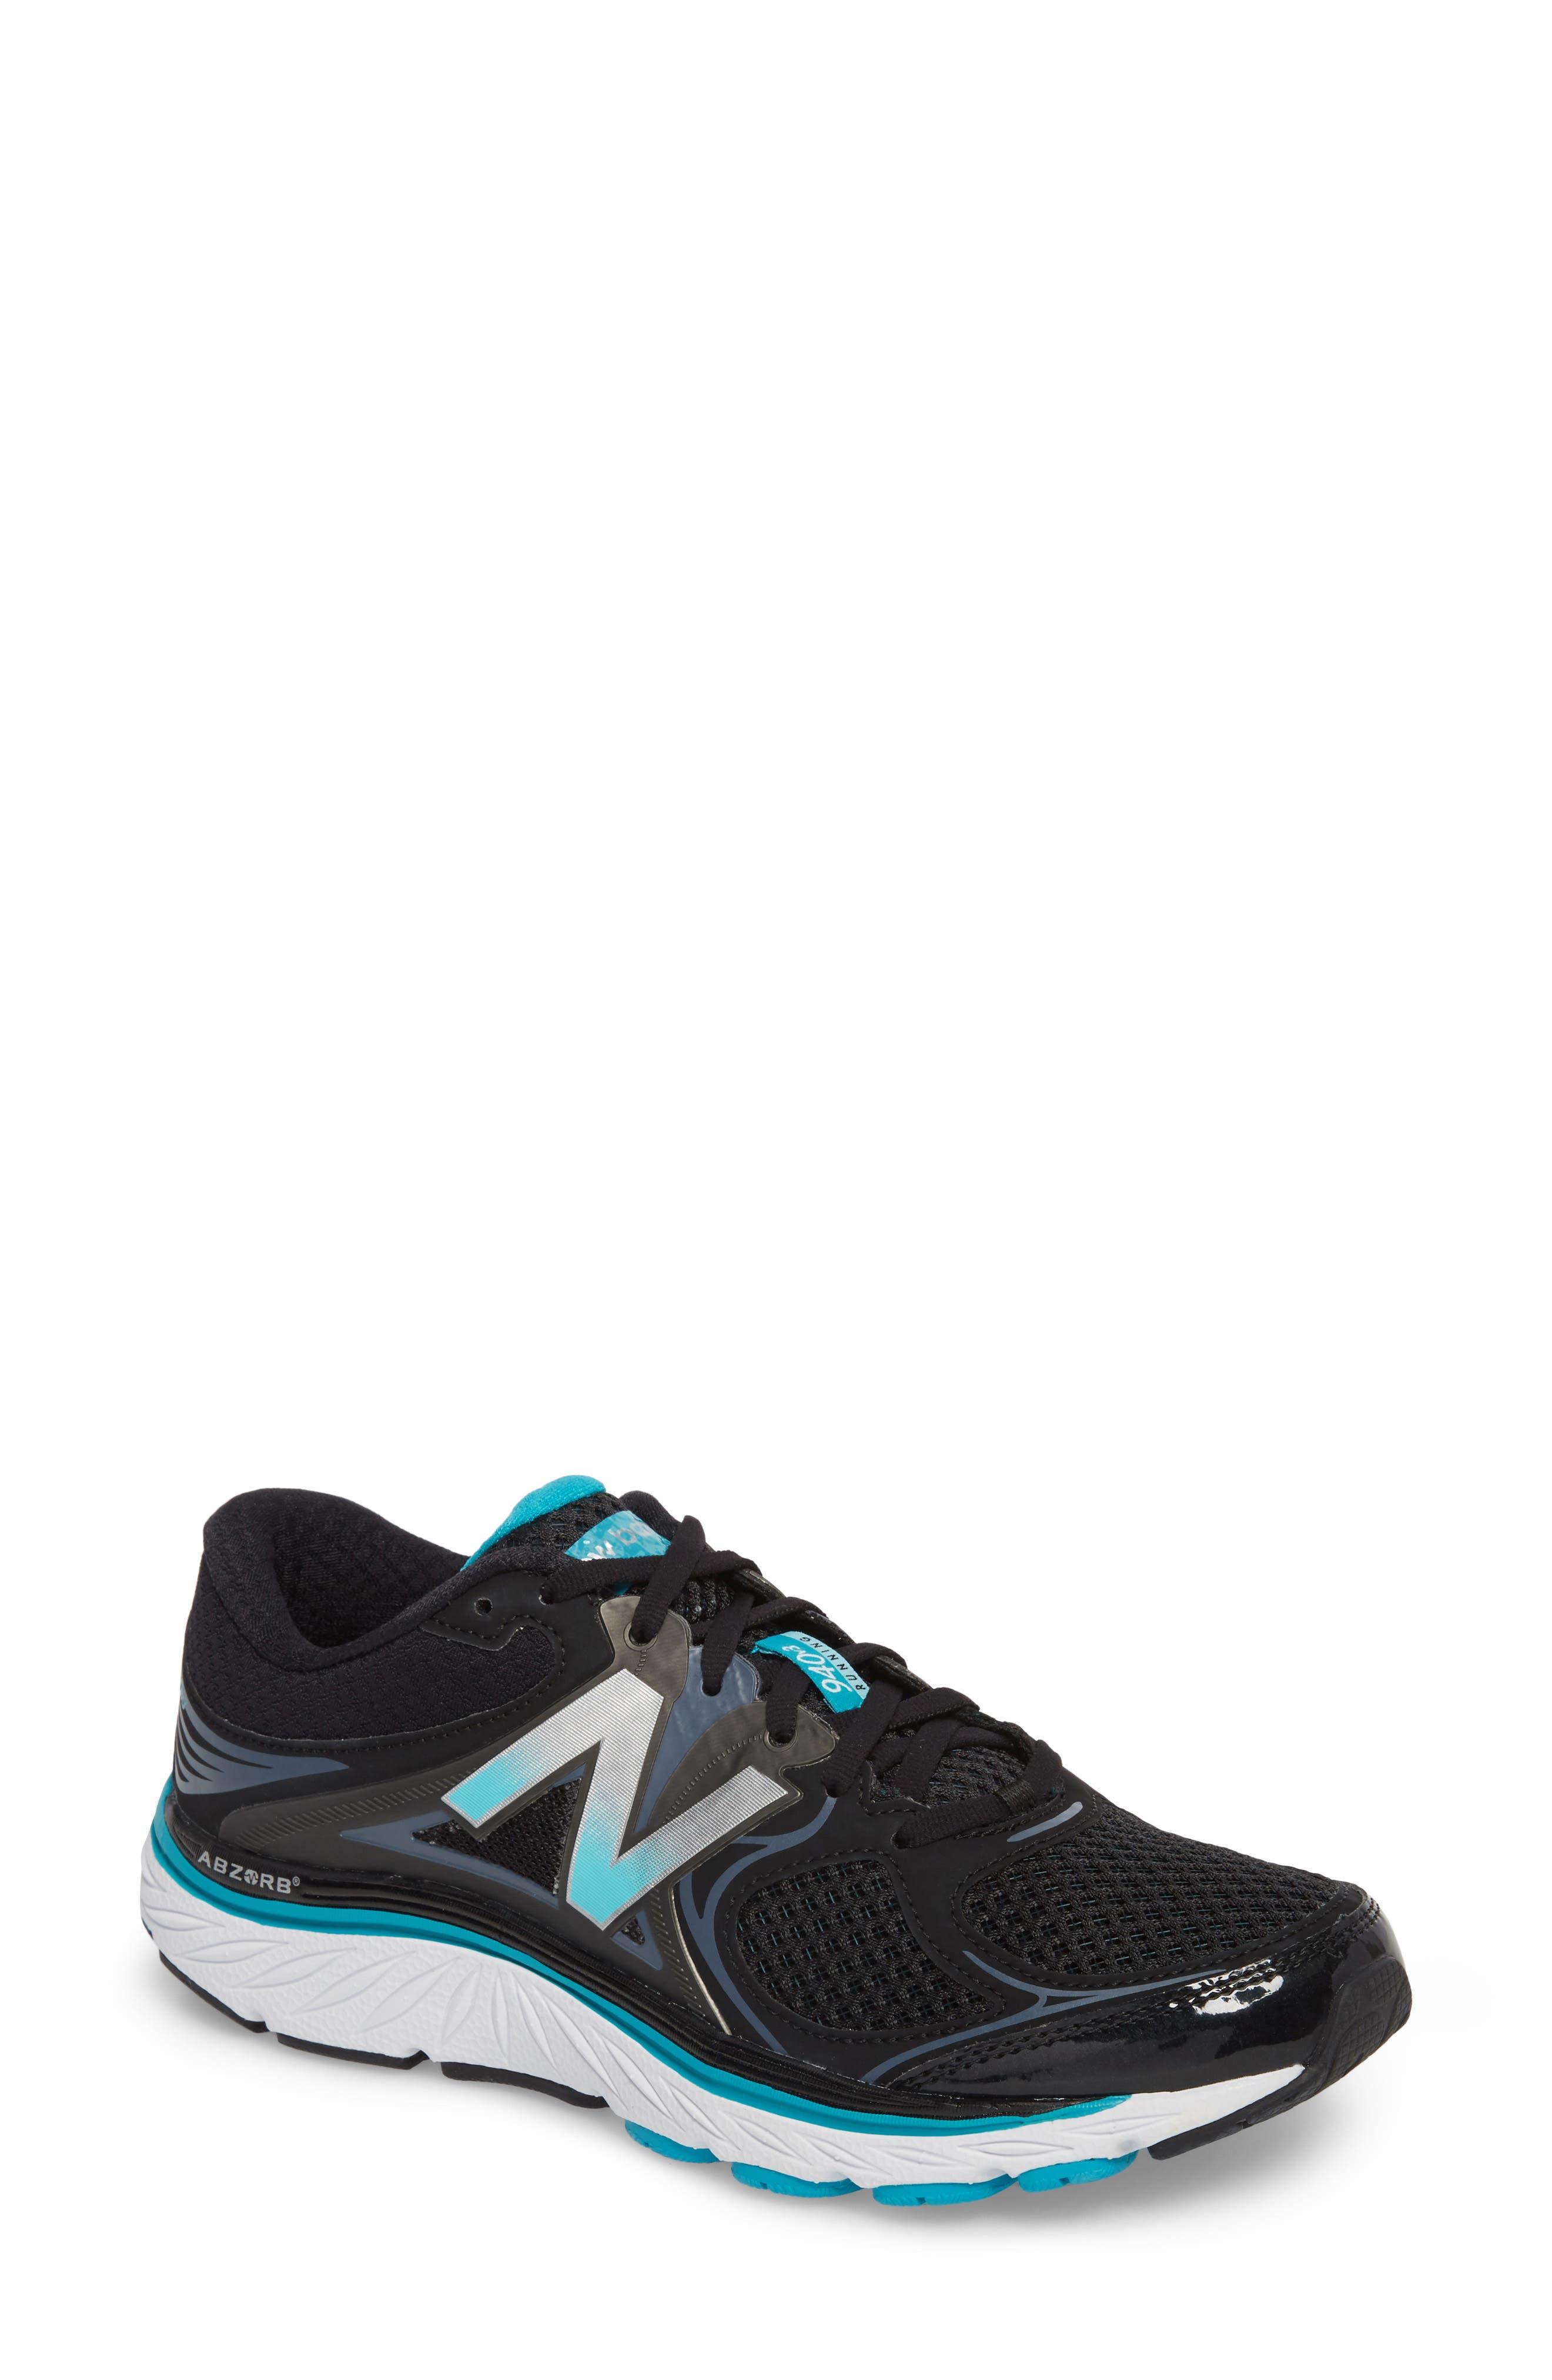 NEW BALANCE 940v3 Running Shoe, Main, color, BLACK/ BLUE